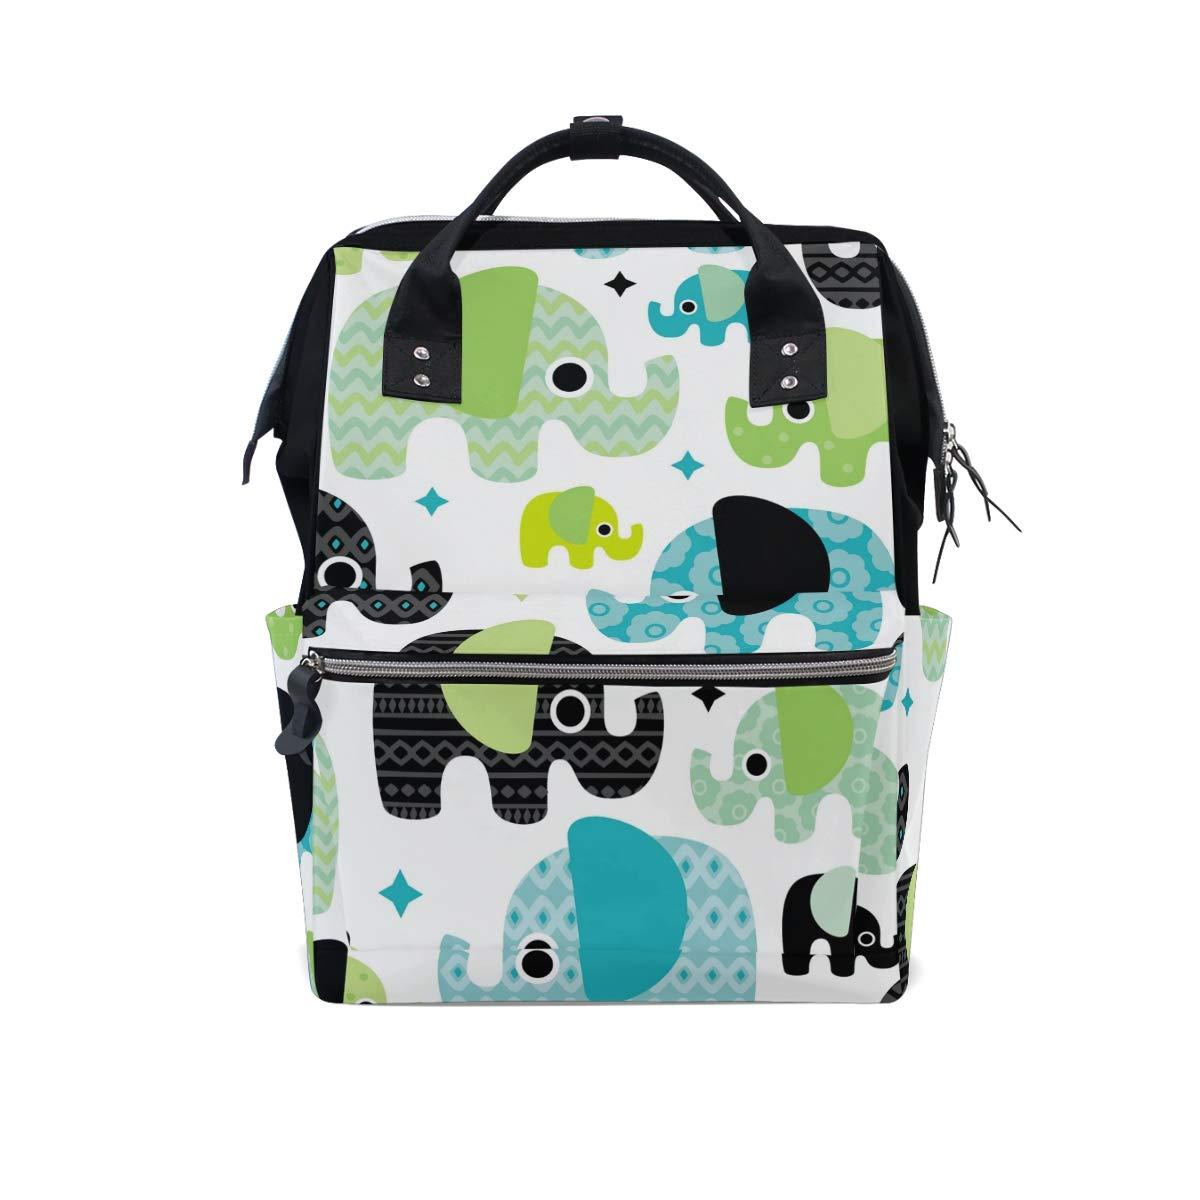 MERRYSUGAR Diaper Bag Backpack Cute Cartoon Elephant Flower Multifunction Travel Bag